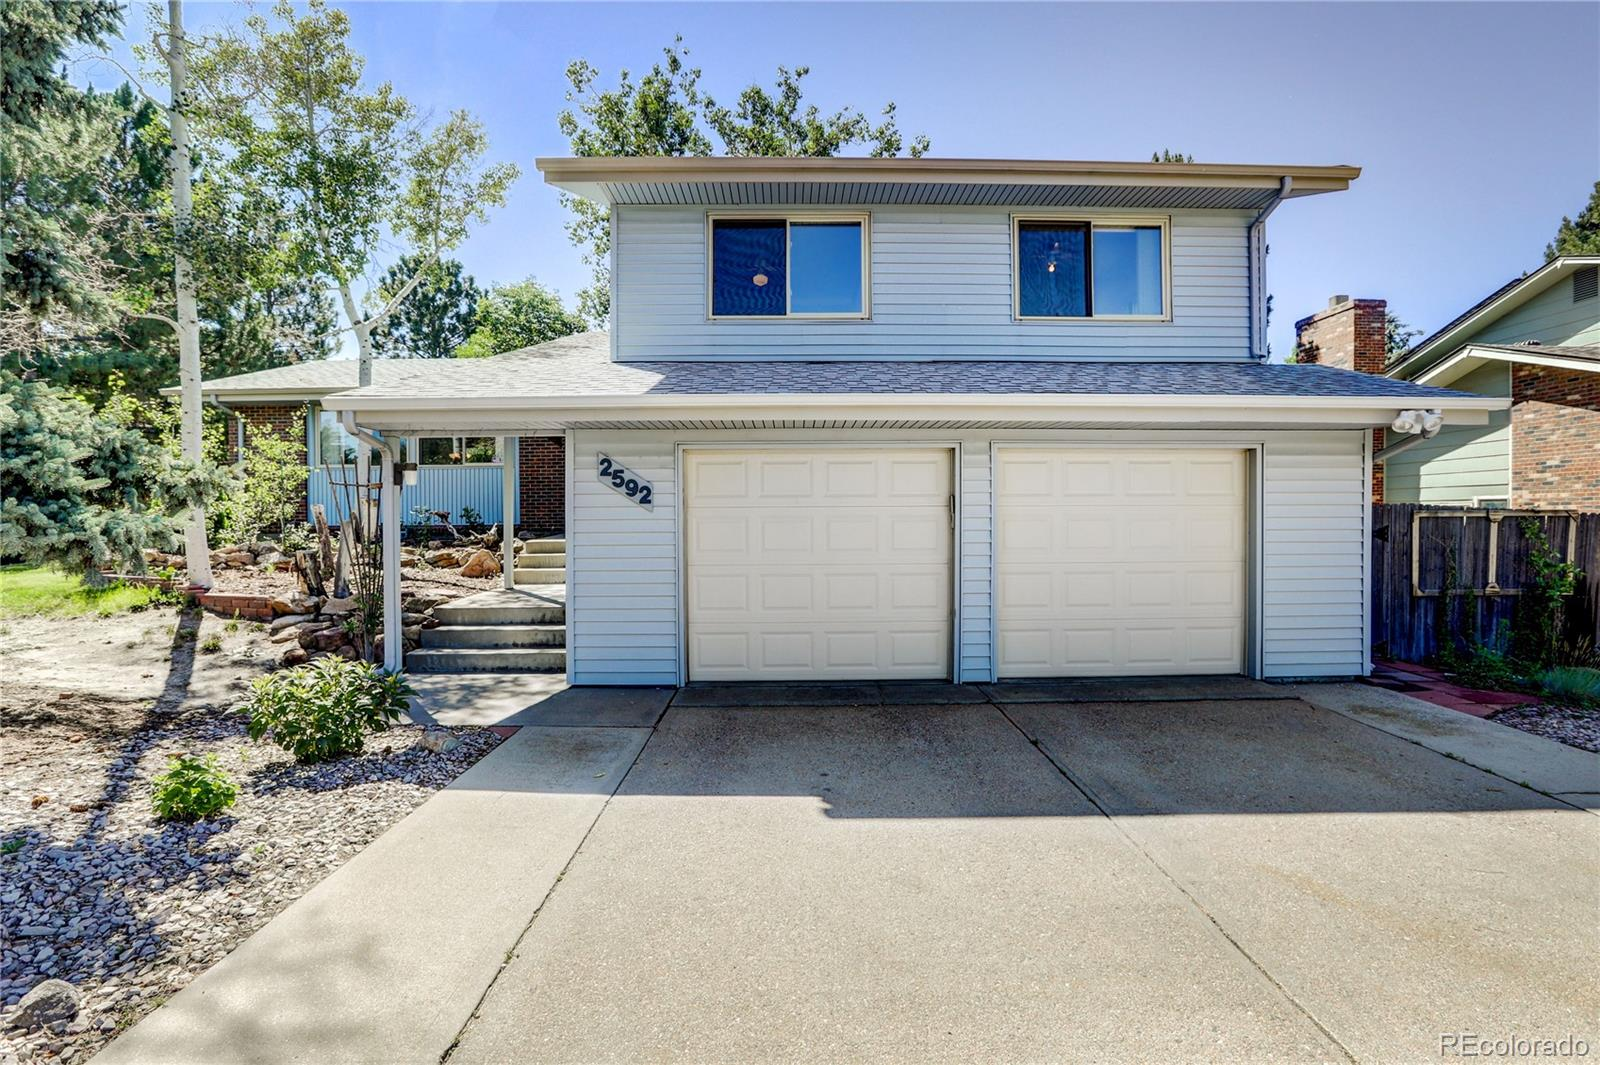 2592 S Lima Street Property Photo - Aurora, CO real estate listing